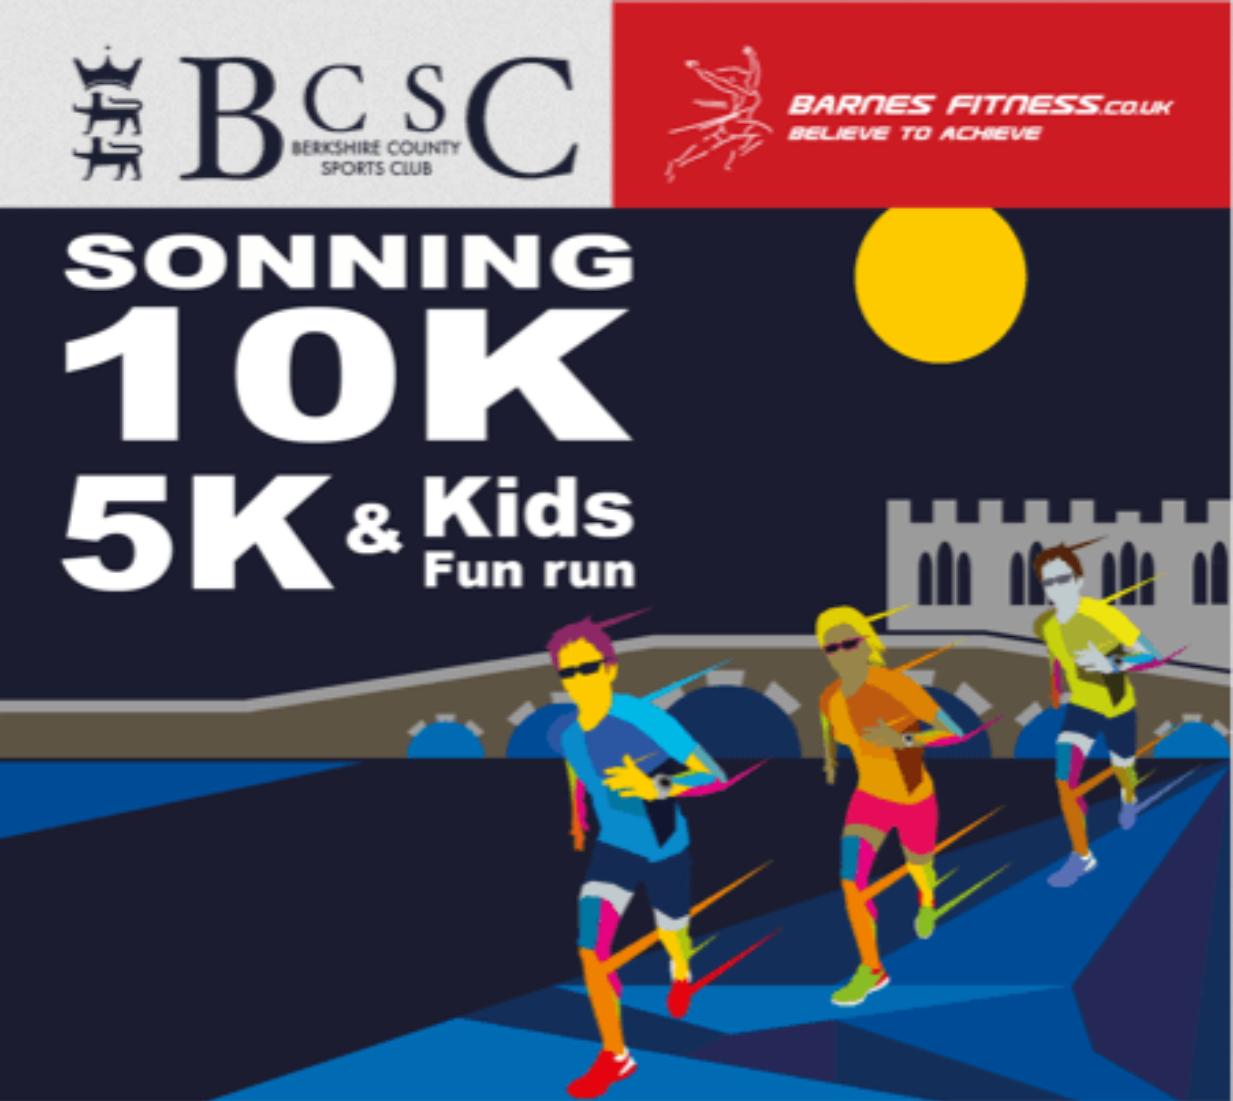 Sonning 10K \u0026 5K - cover image